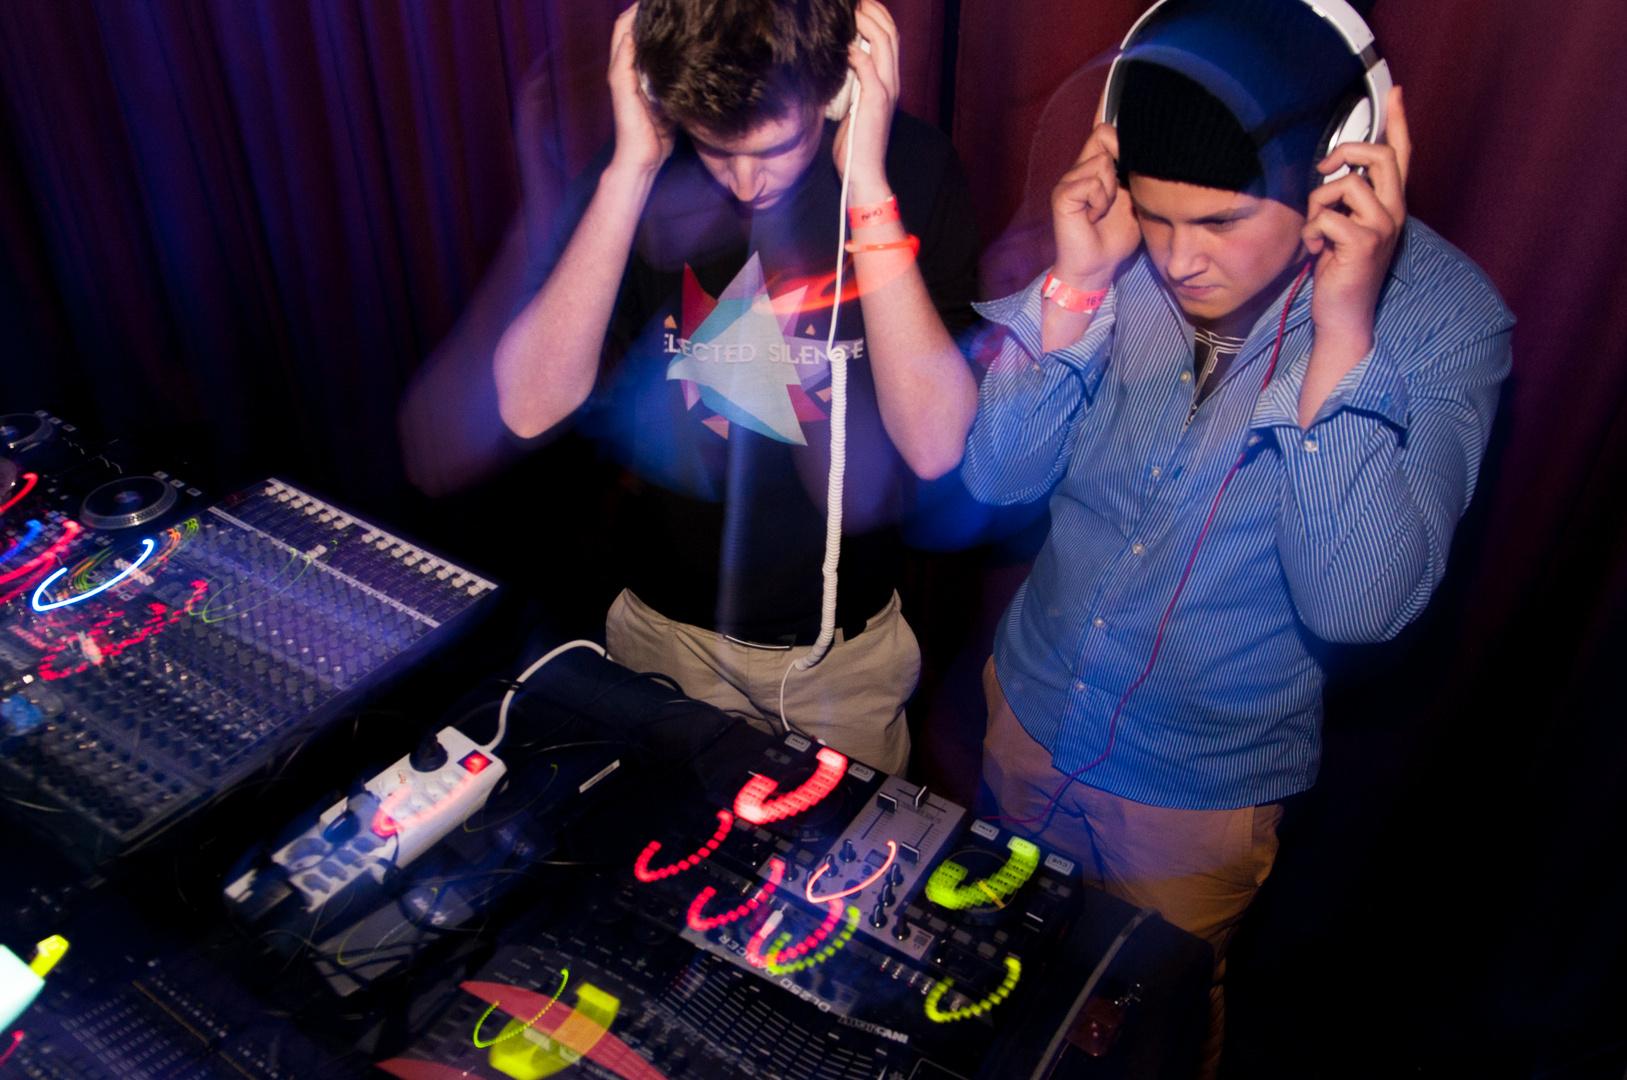 DJ Selected Silence